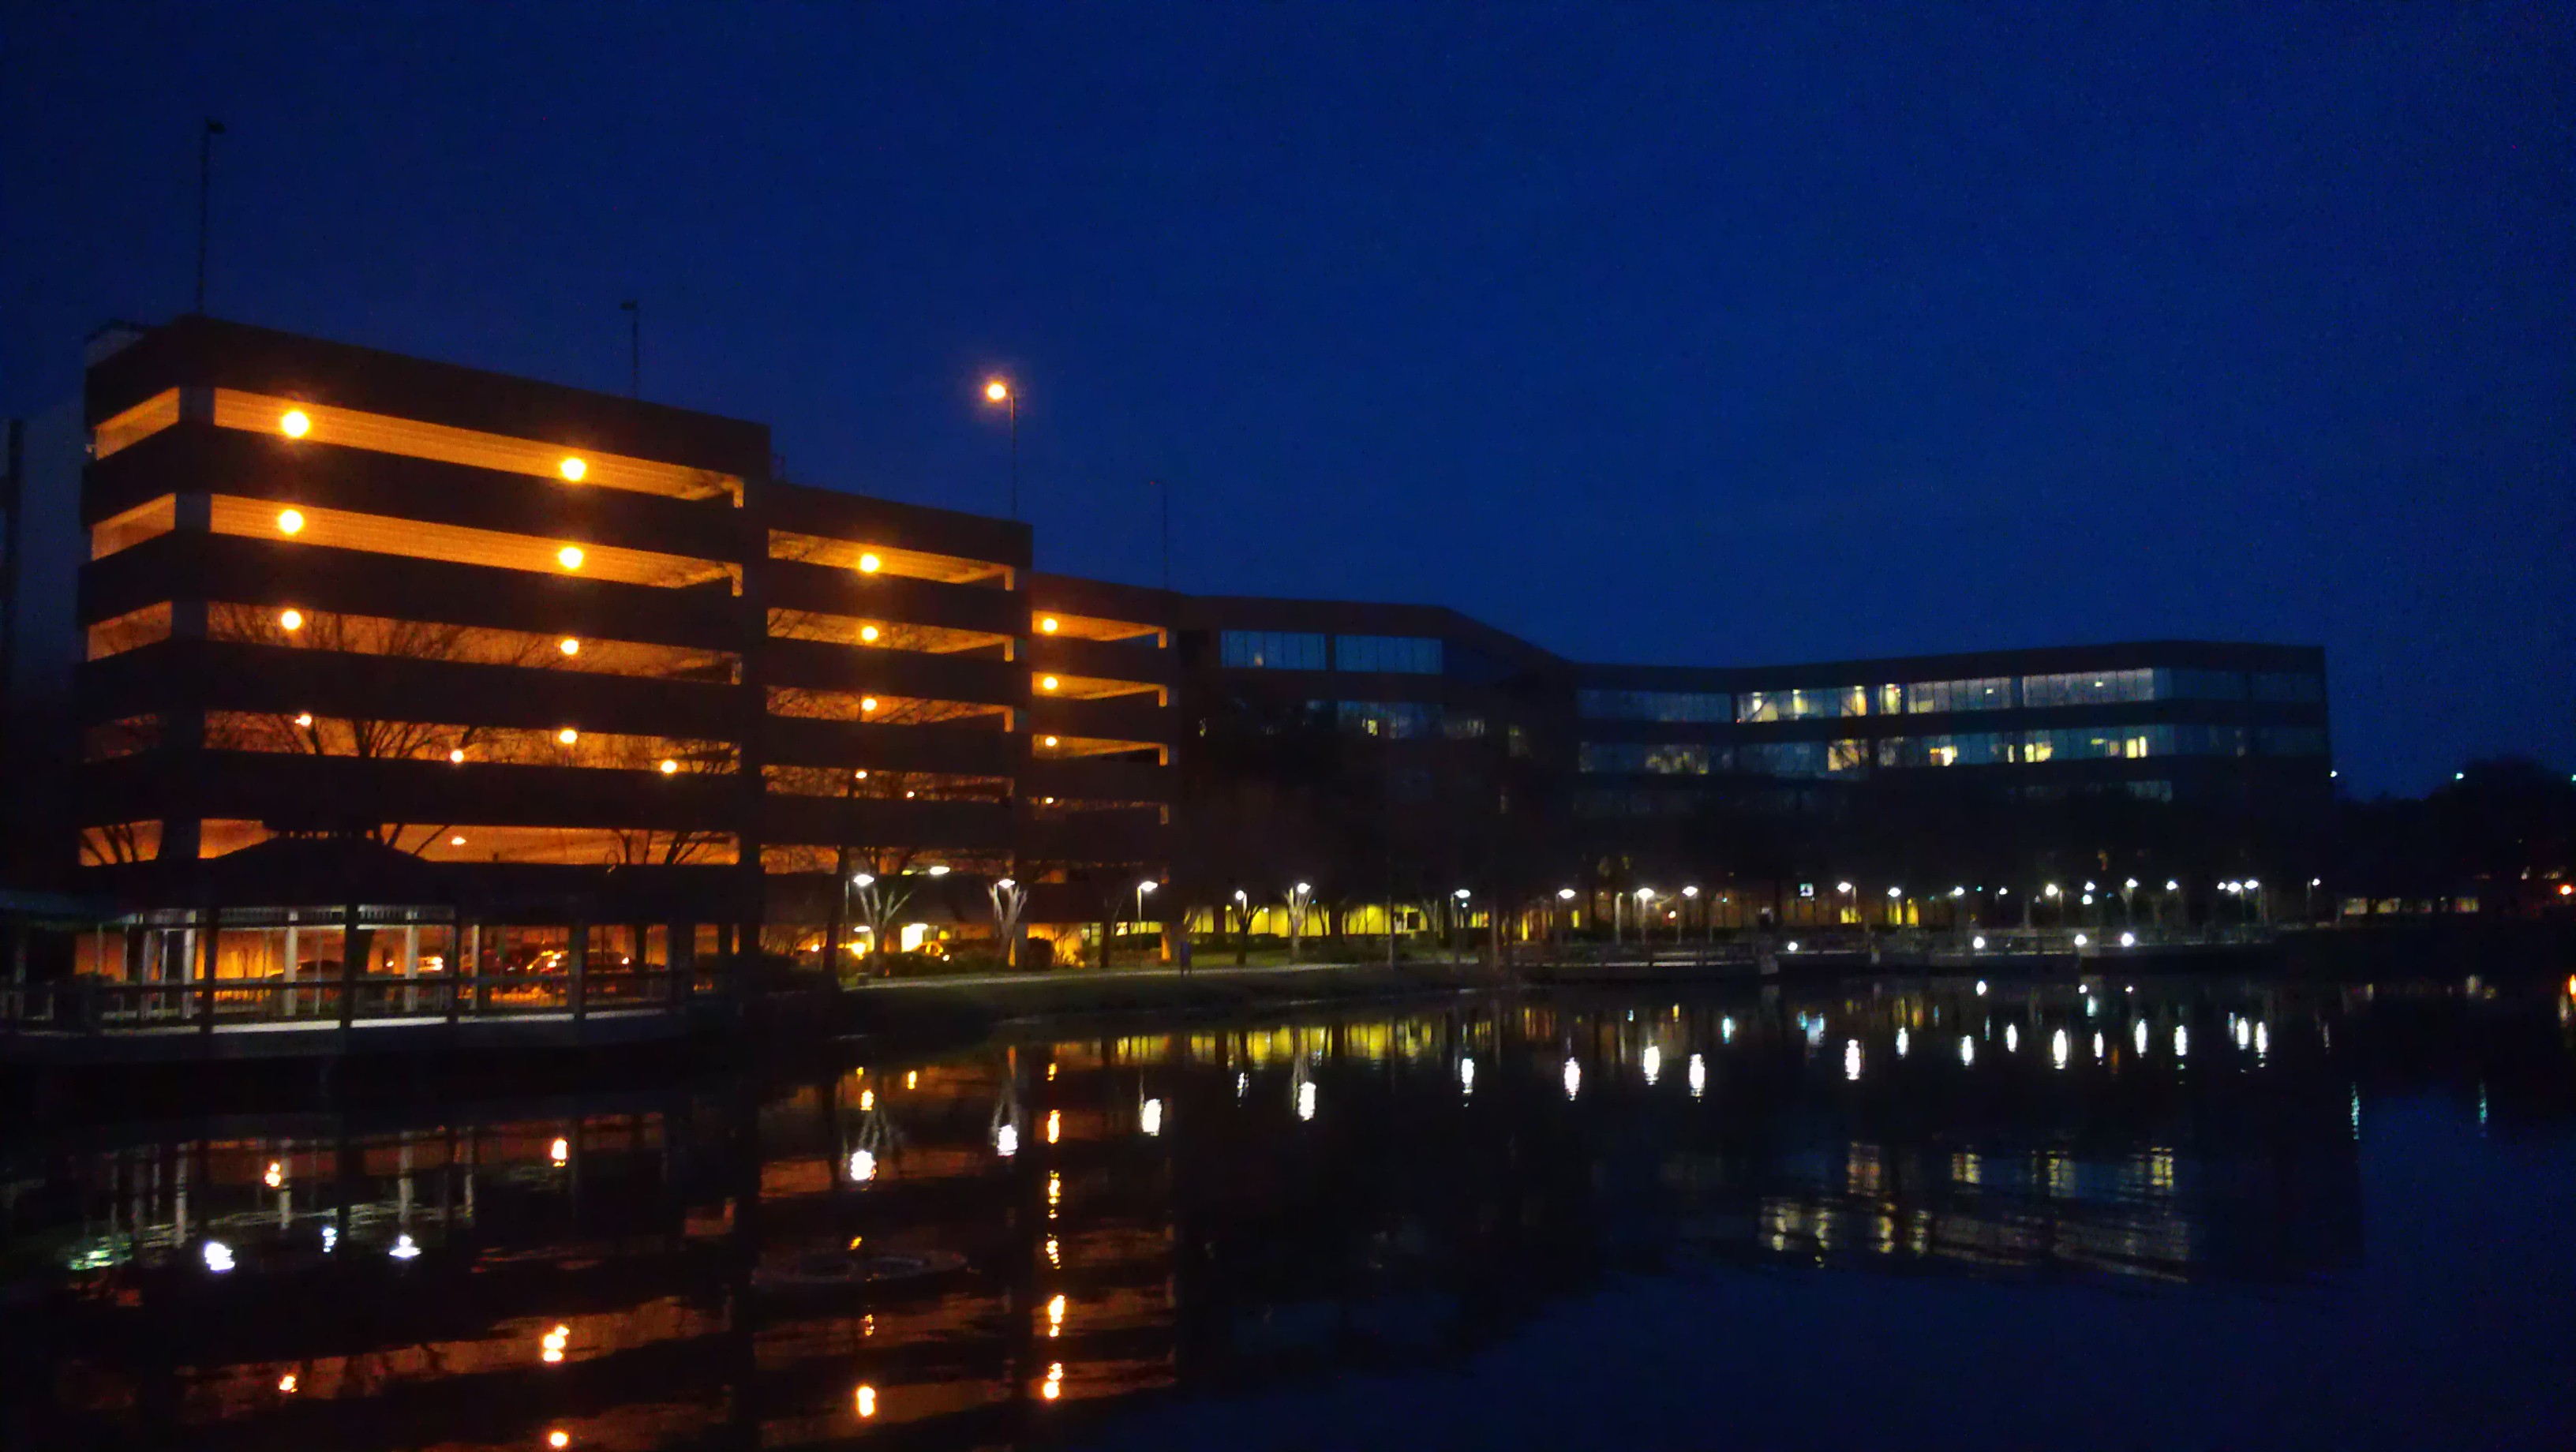 FileFlorida Coastal School Of Law At Night